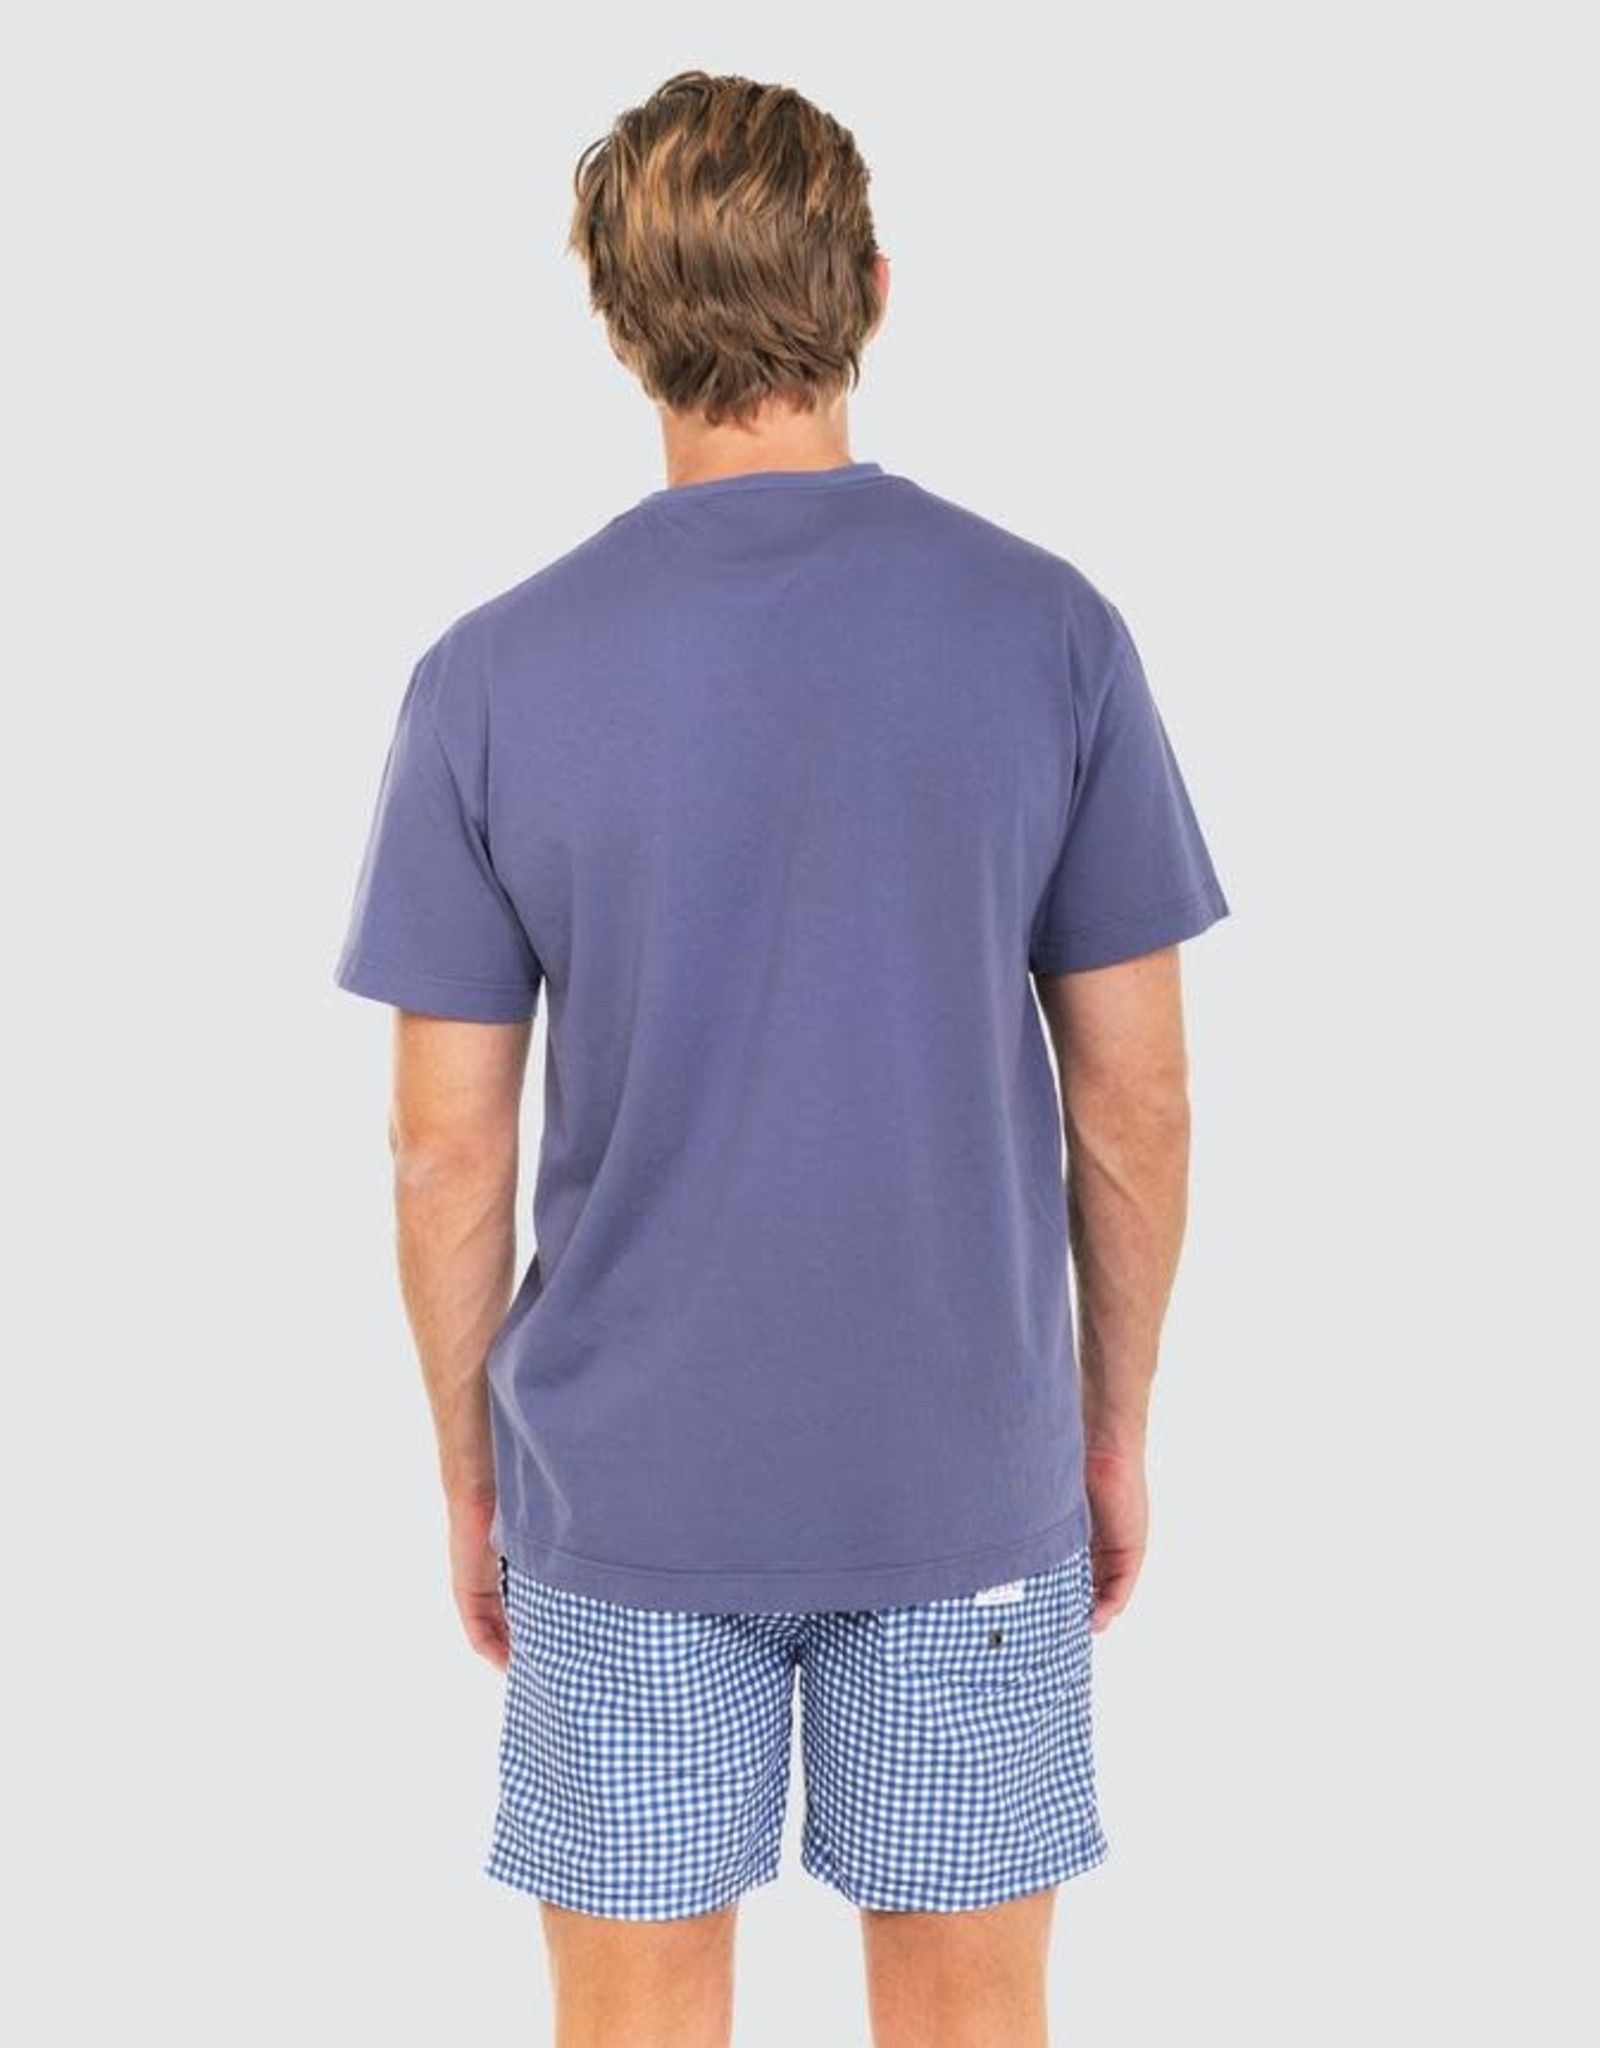 ORTC Flag T-Shirt